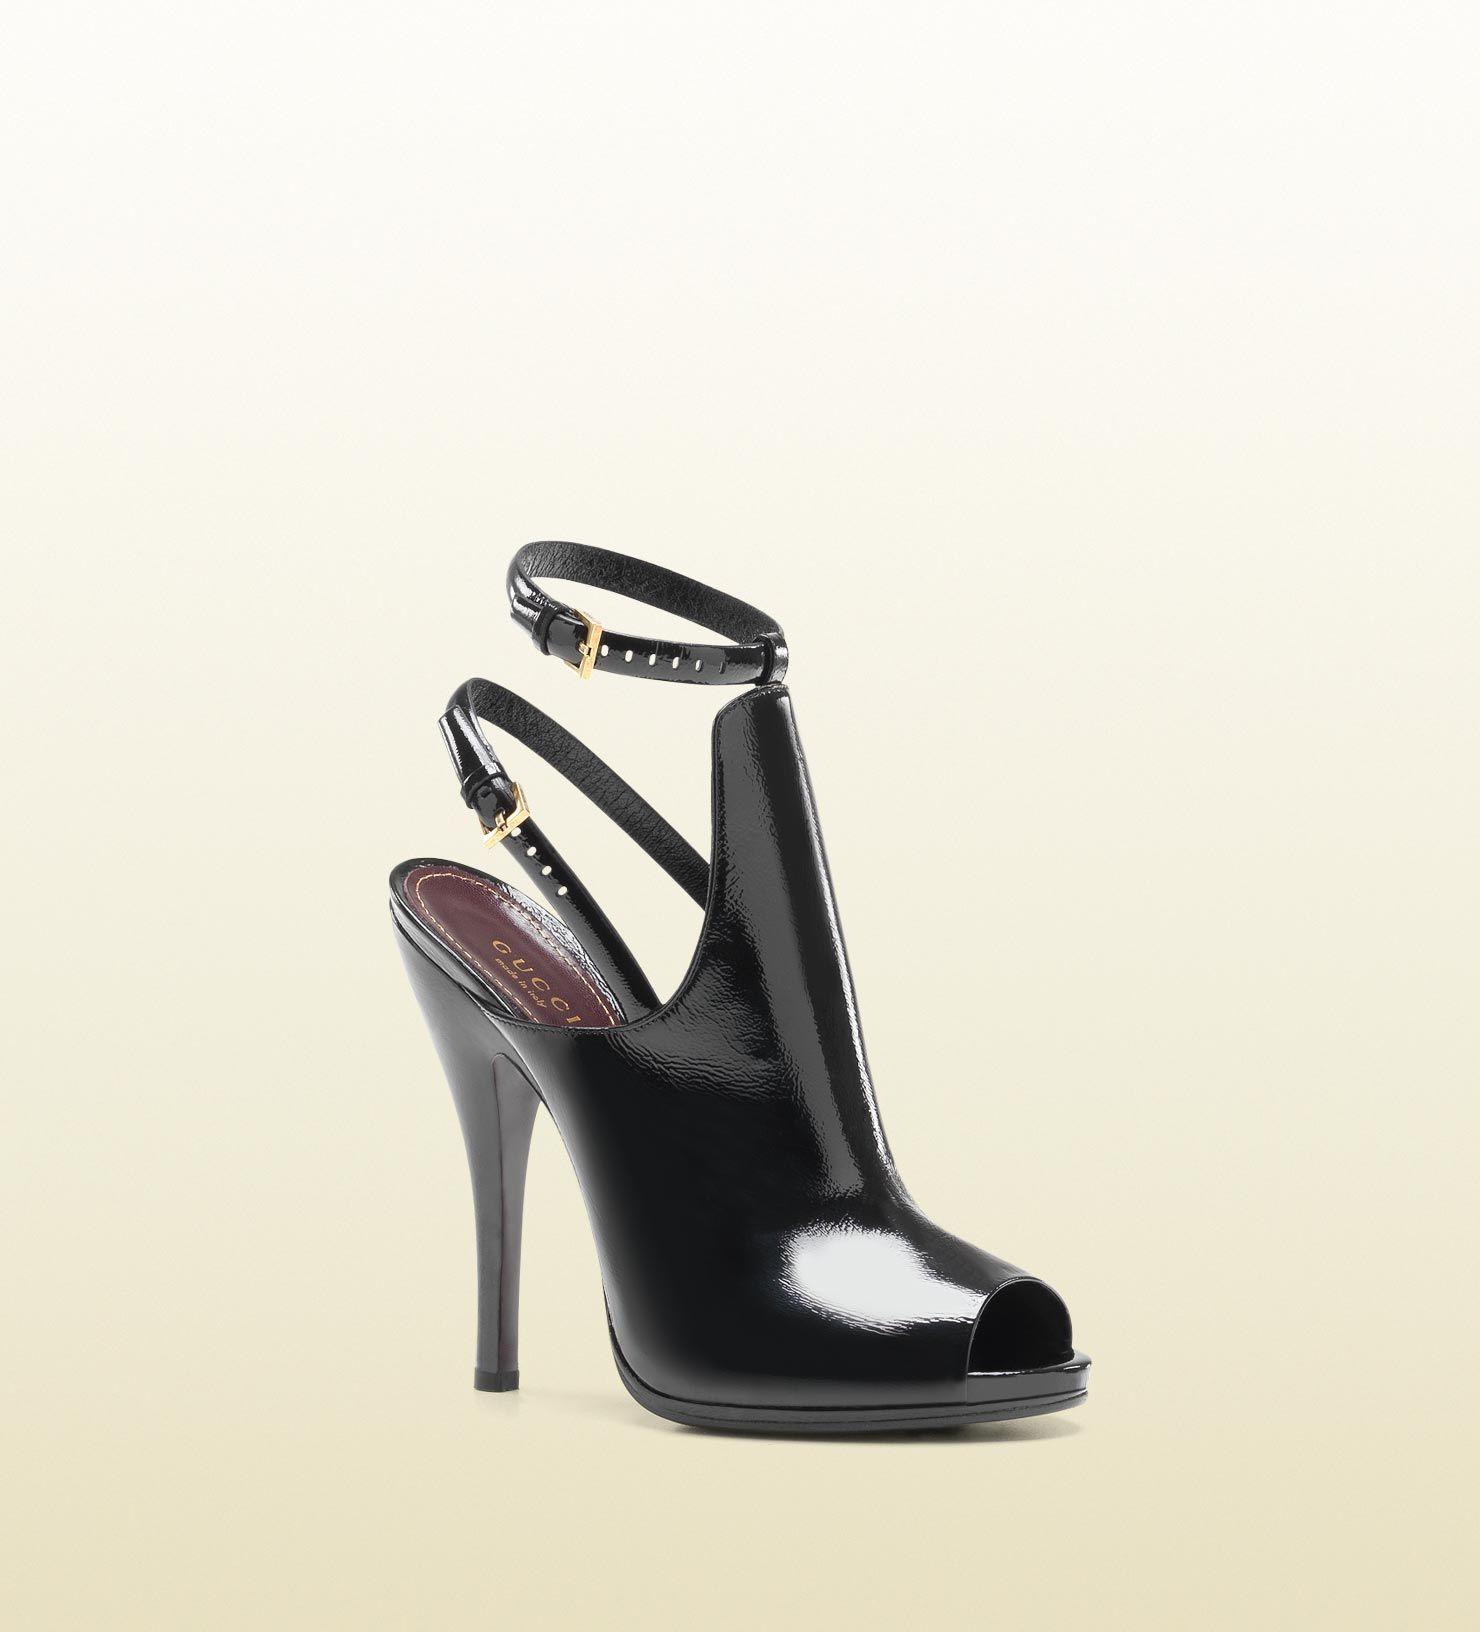 rDqHNOyIii Leather Open Toe Boots D6rE84C